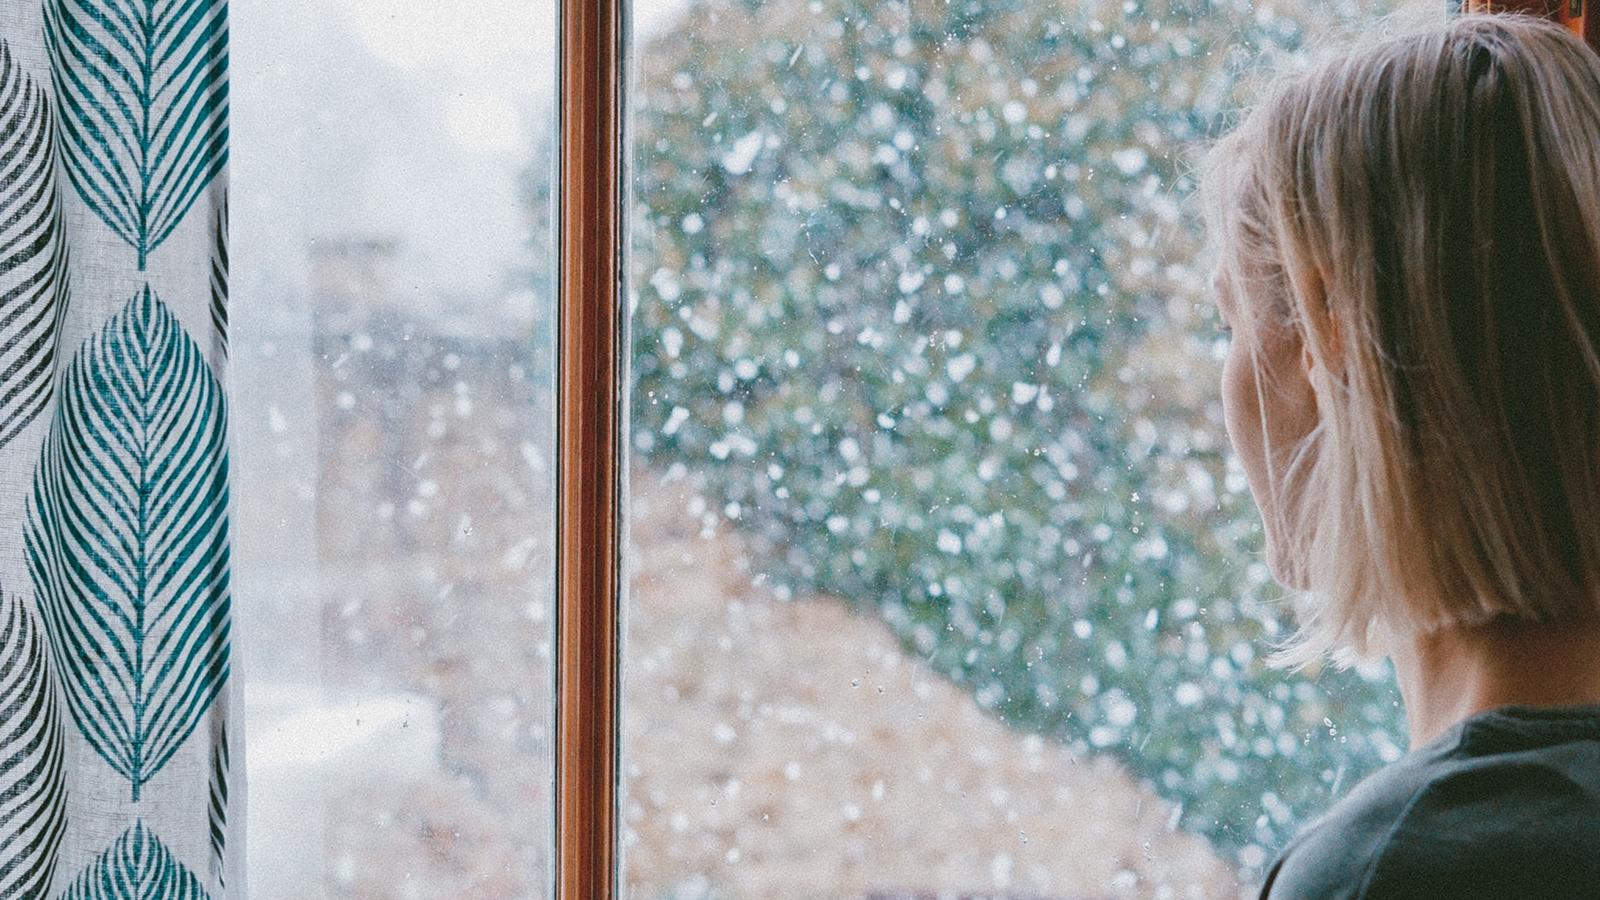 Nainen katsoo selin ulos ikkunasta, ulkona sataa lunta.